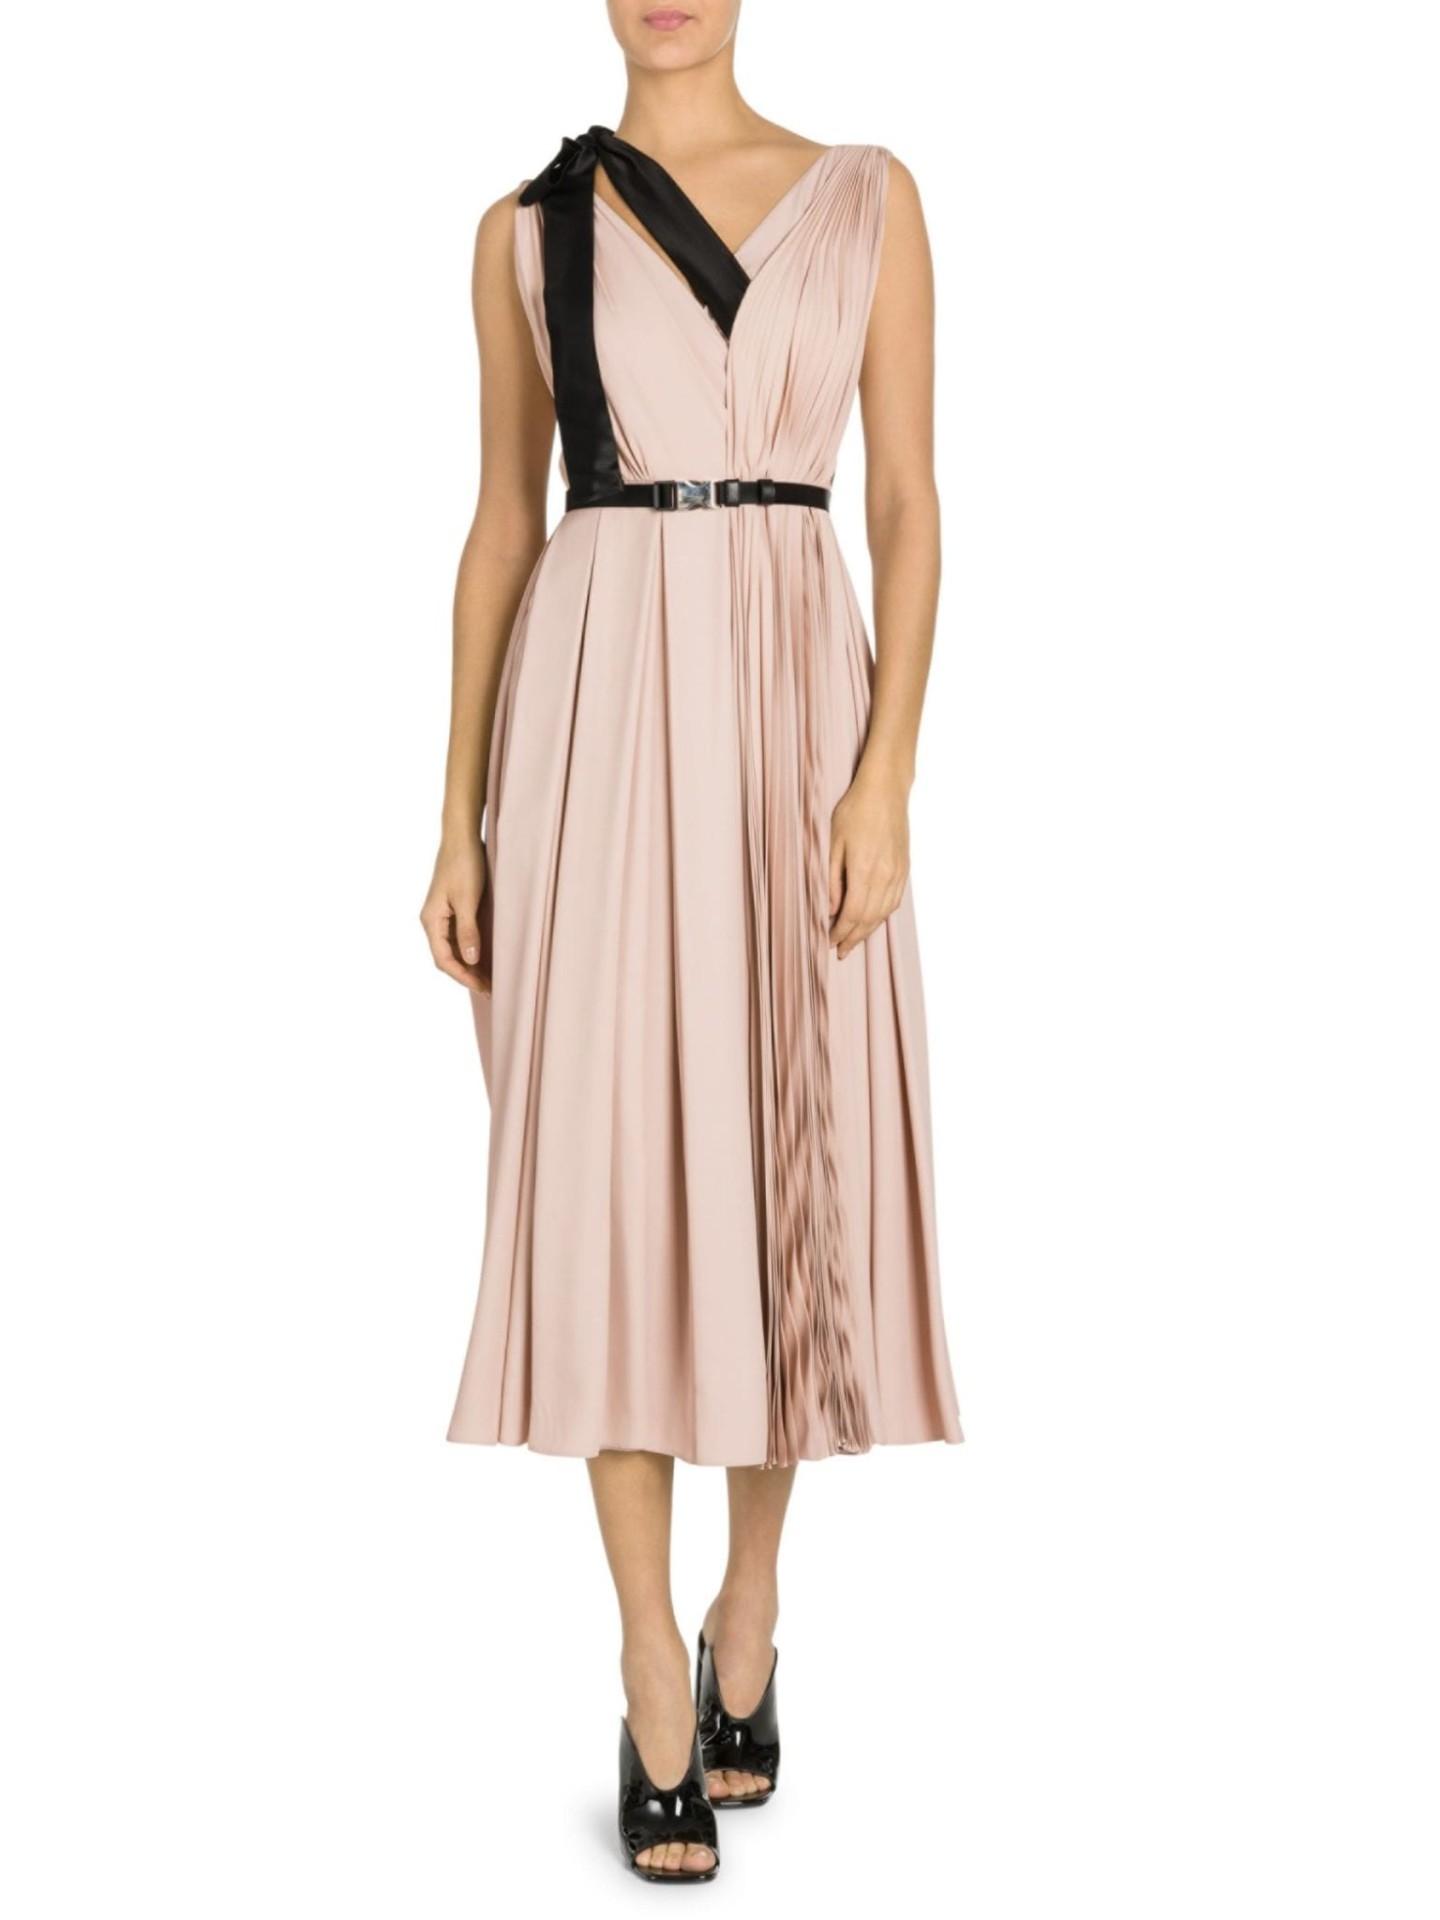 PRADA Ribbon Detail Pleated V-Neck Midi Pink Dress